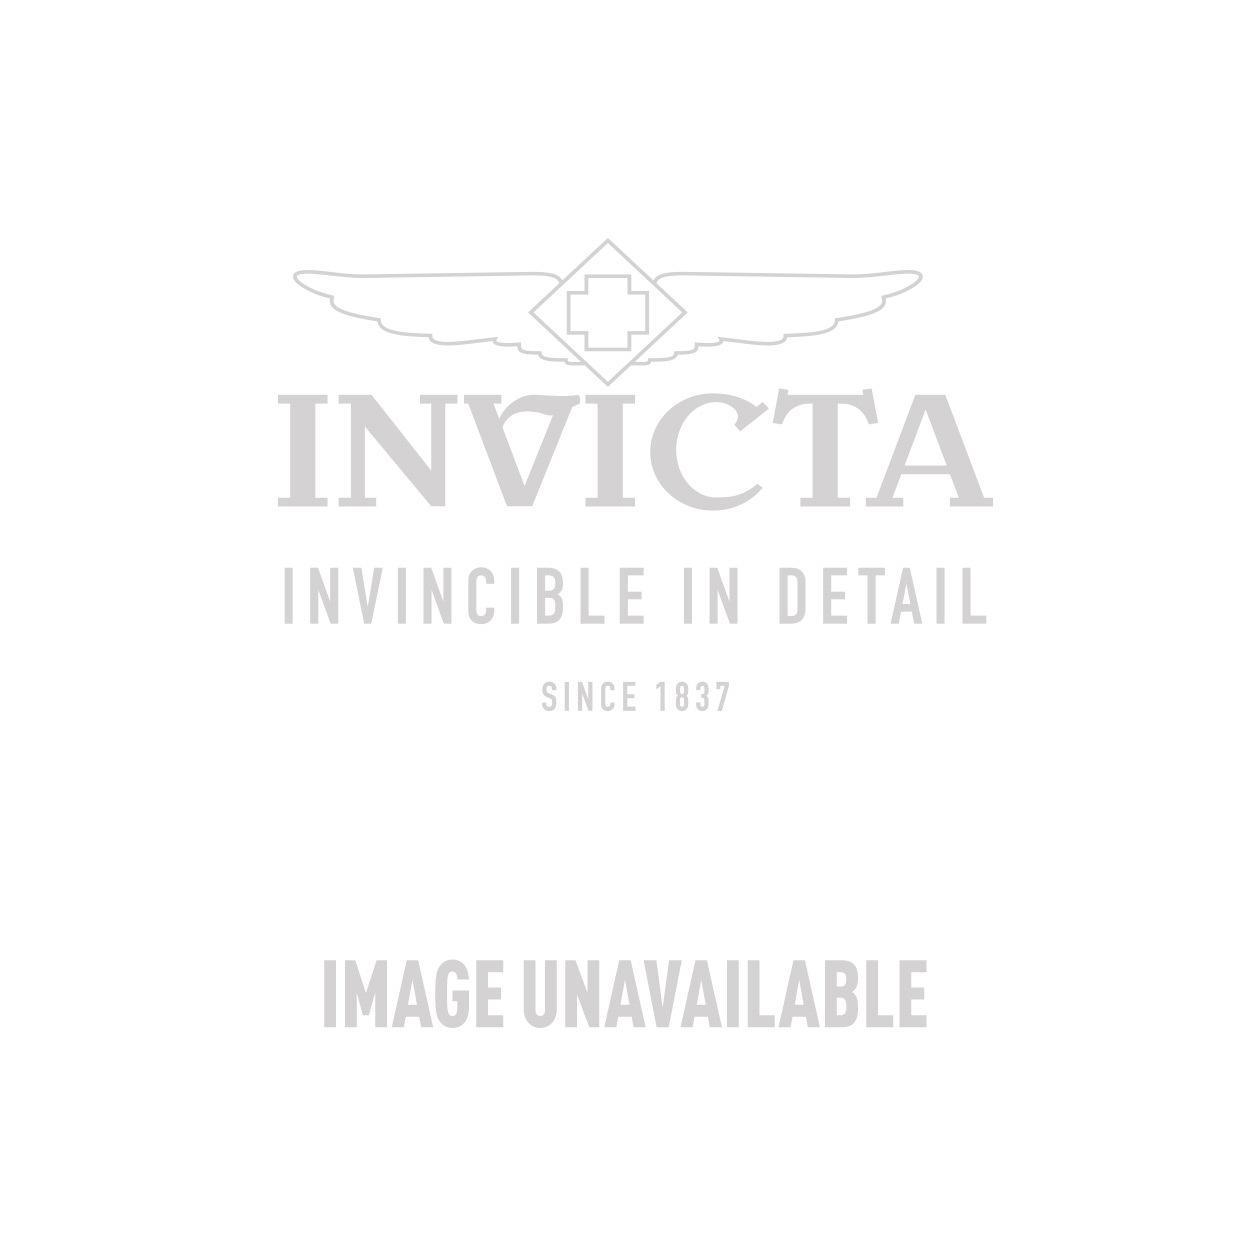 Invicta Reserve  Quartz Watch - Rose Gold case with Rose Gold, Black tone Polyurethane band - Model 80366